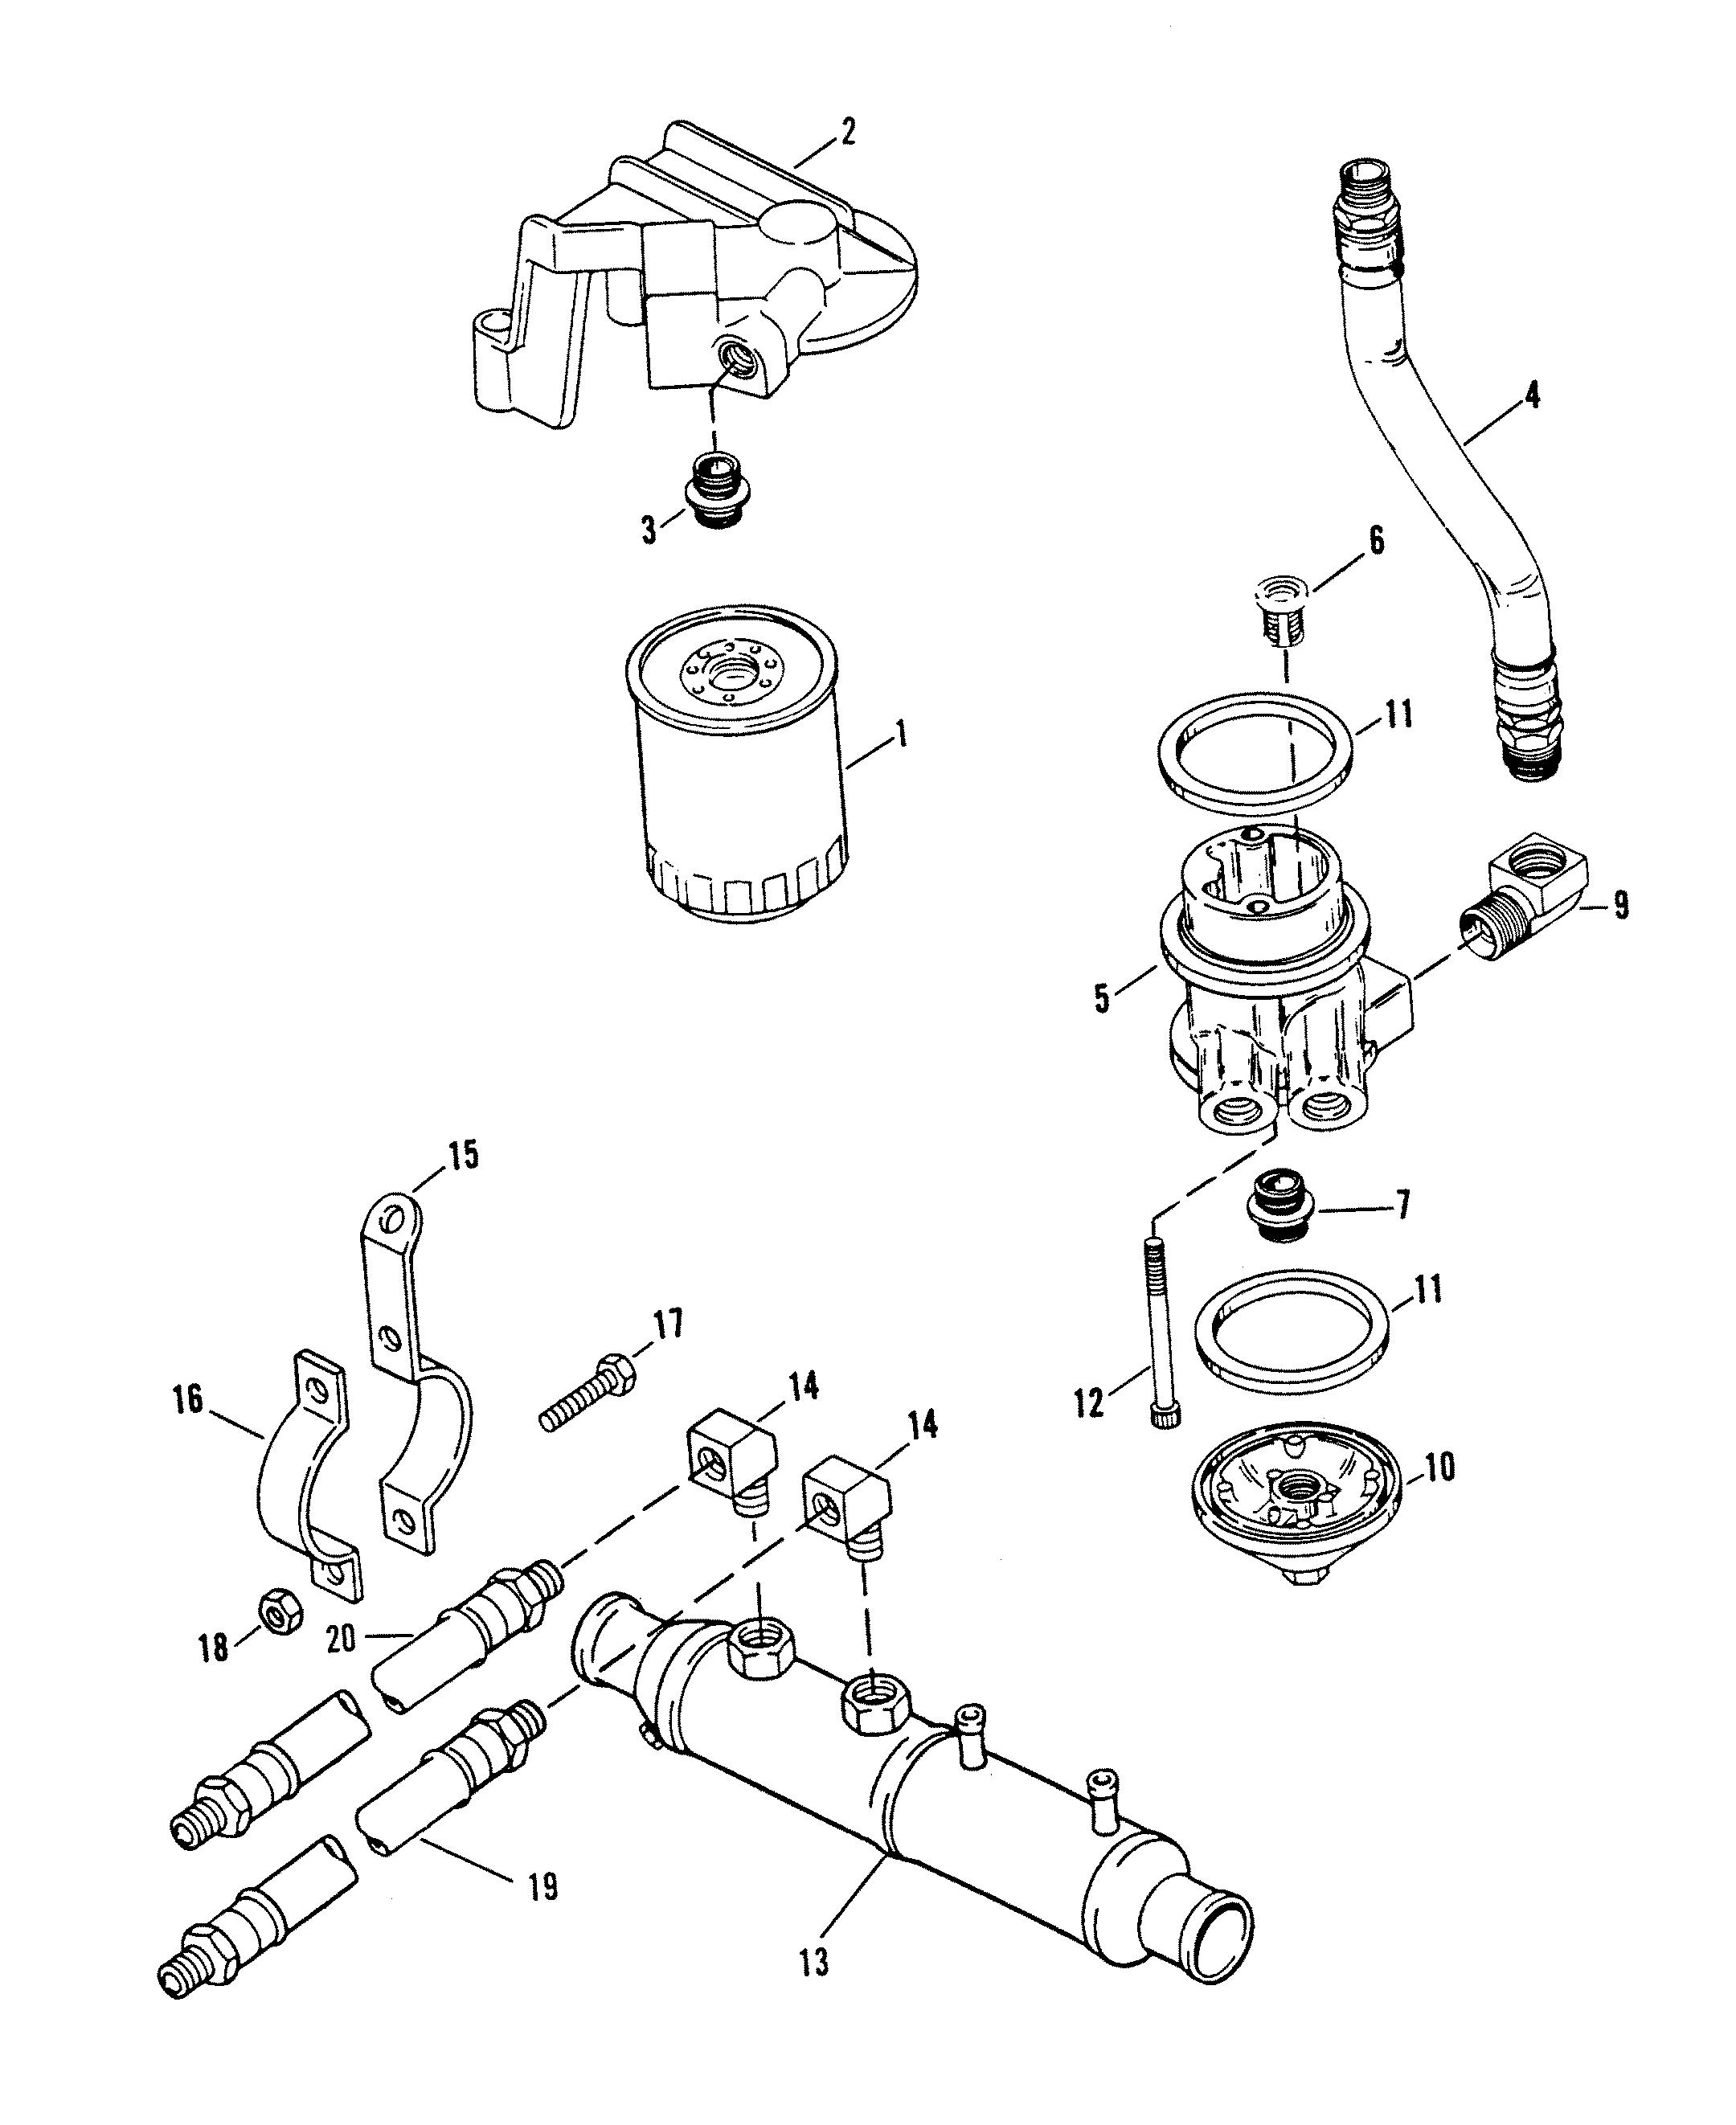 Oil Filter And Adaptor For Mercruiser 454 Magnum Bravo Engine